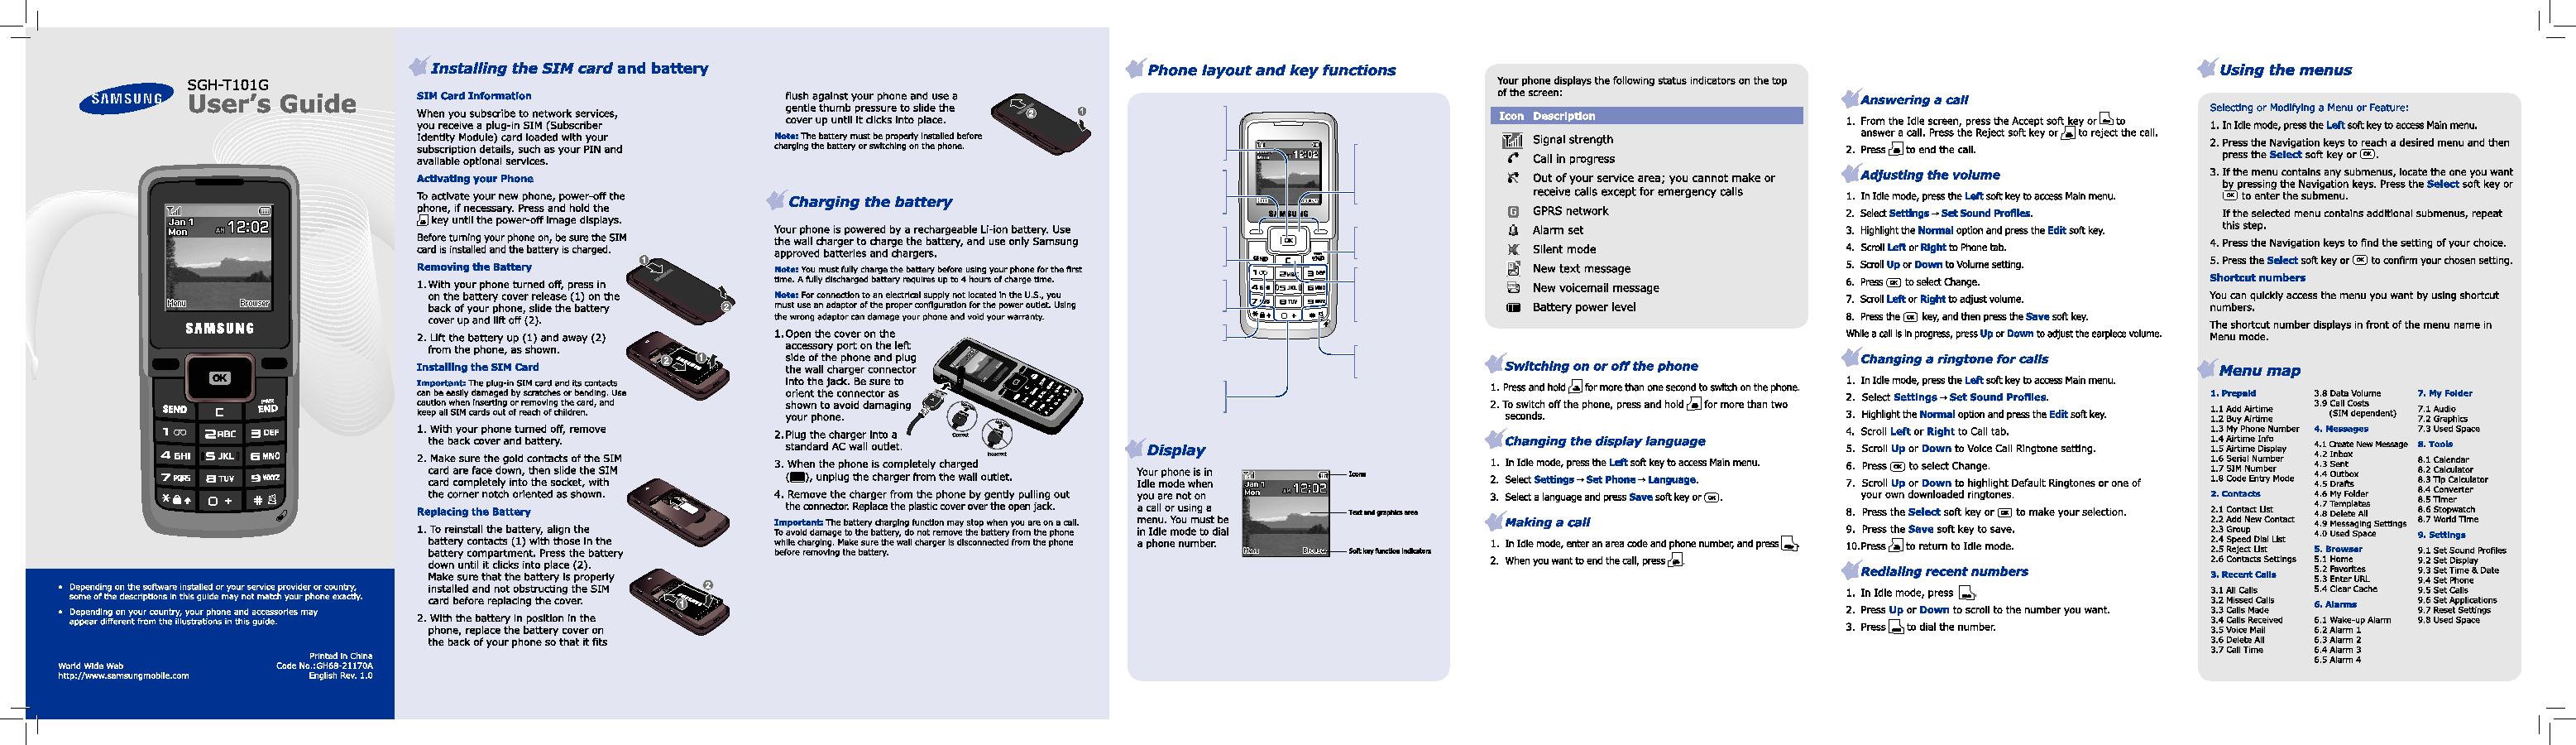 samsung sgh t101g tracfone sgh t101g user manual english ver f5 rh samsung 6c0 net english user manual for toshiba ovens english user manual for marklin 60657